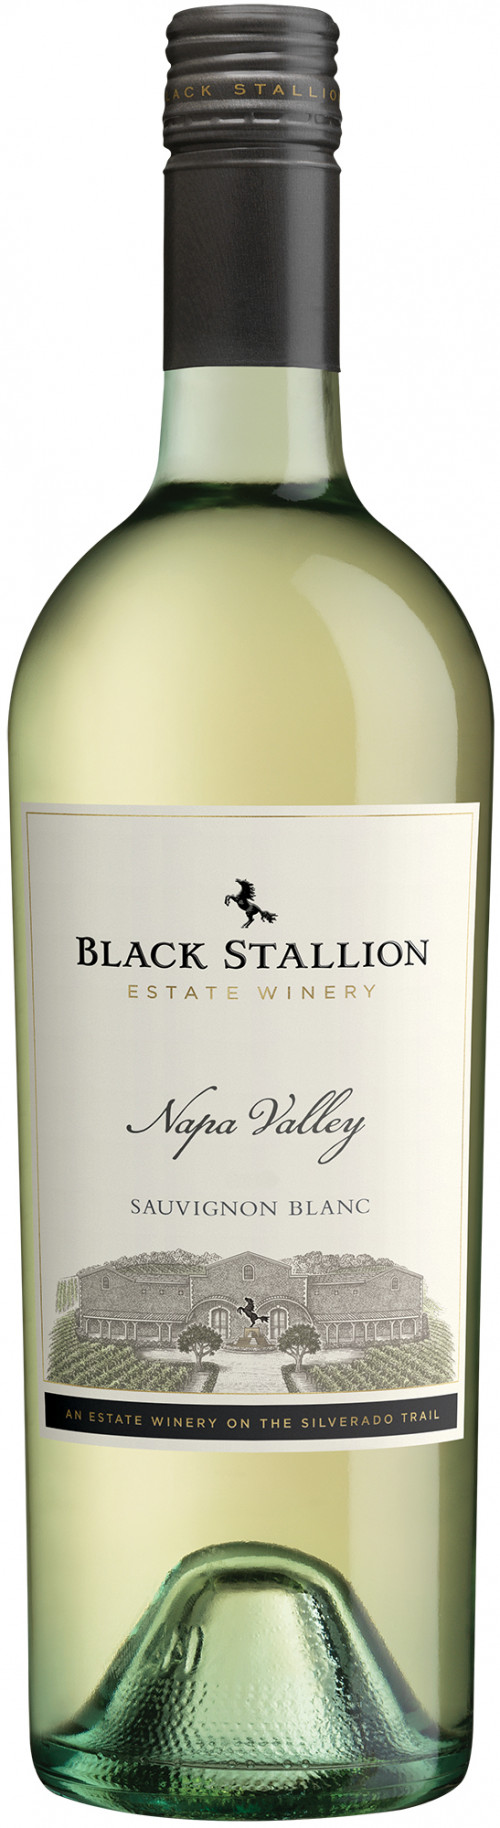 2019 Black Stallion Napa Sauvignon Blanc 750ml